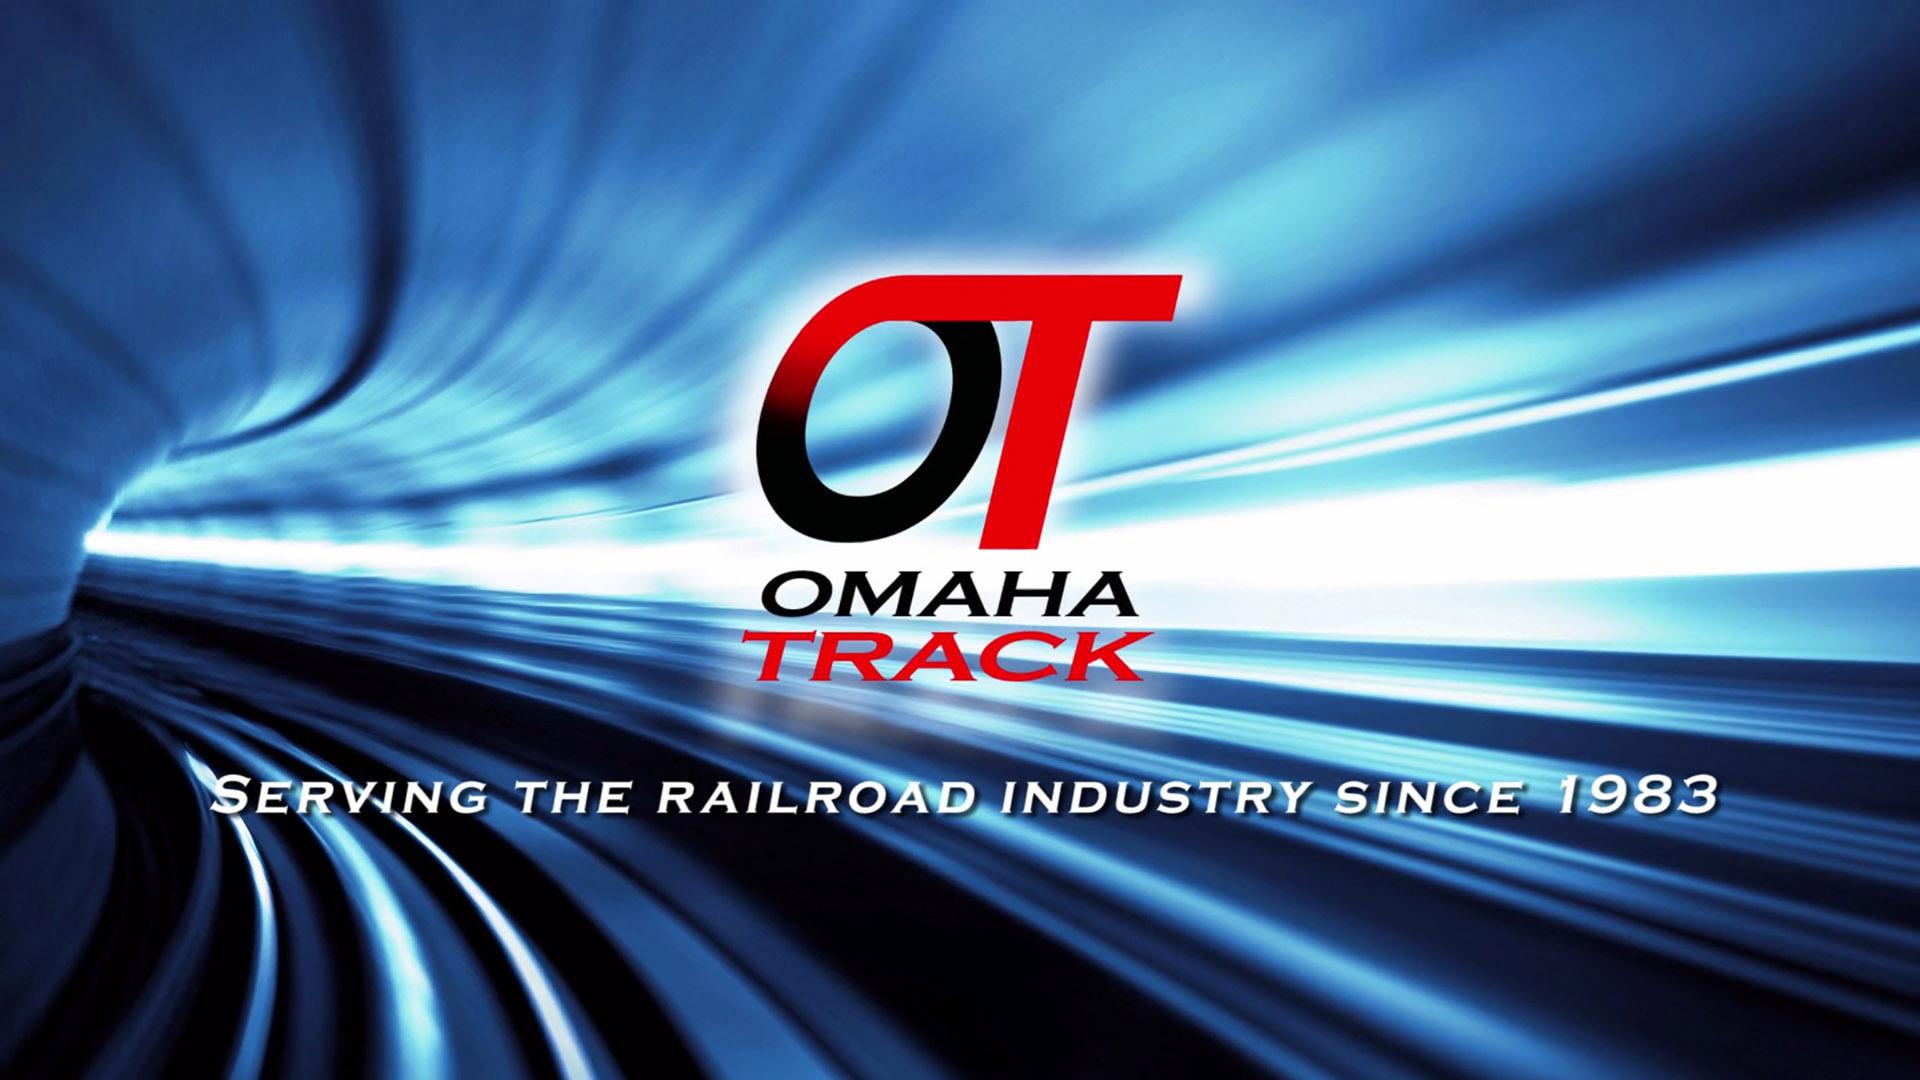 Omaha Track corporate video. Omaha Video Production Company LP Photo Video.